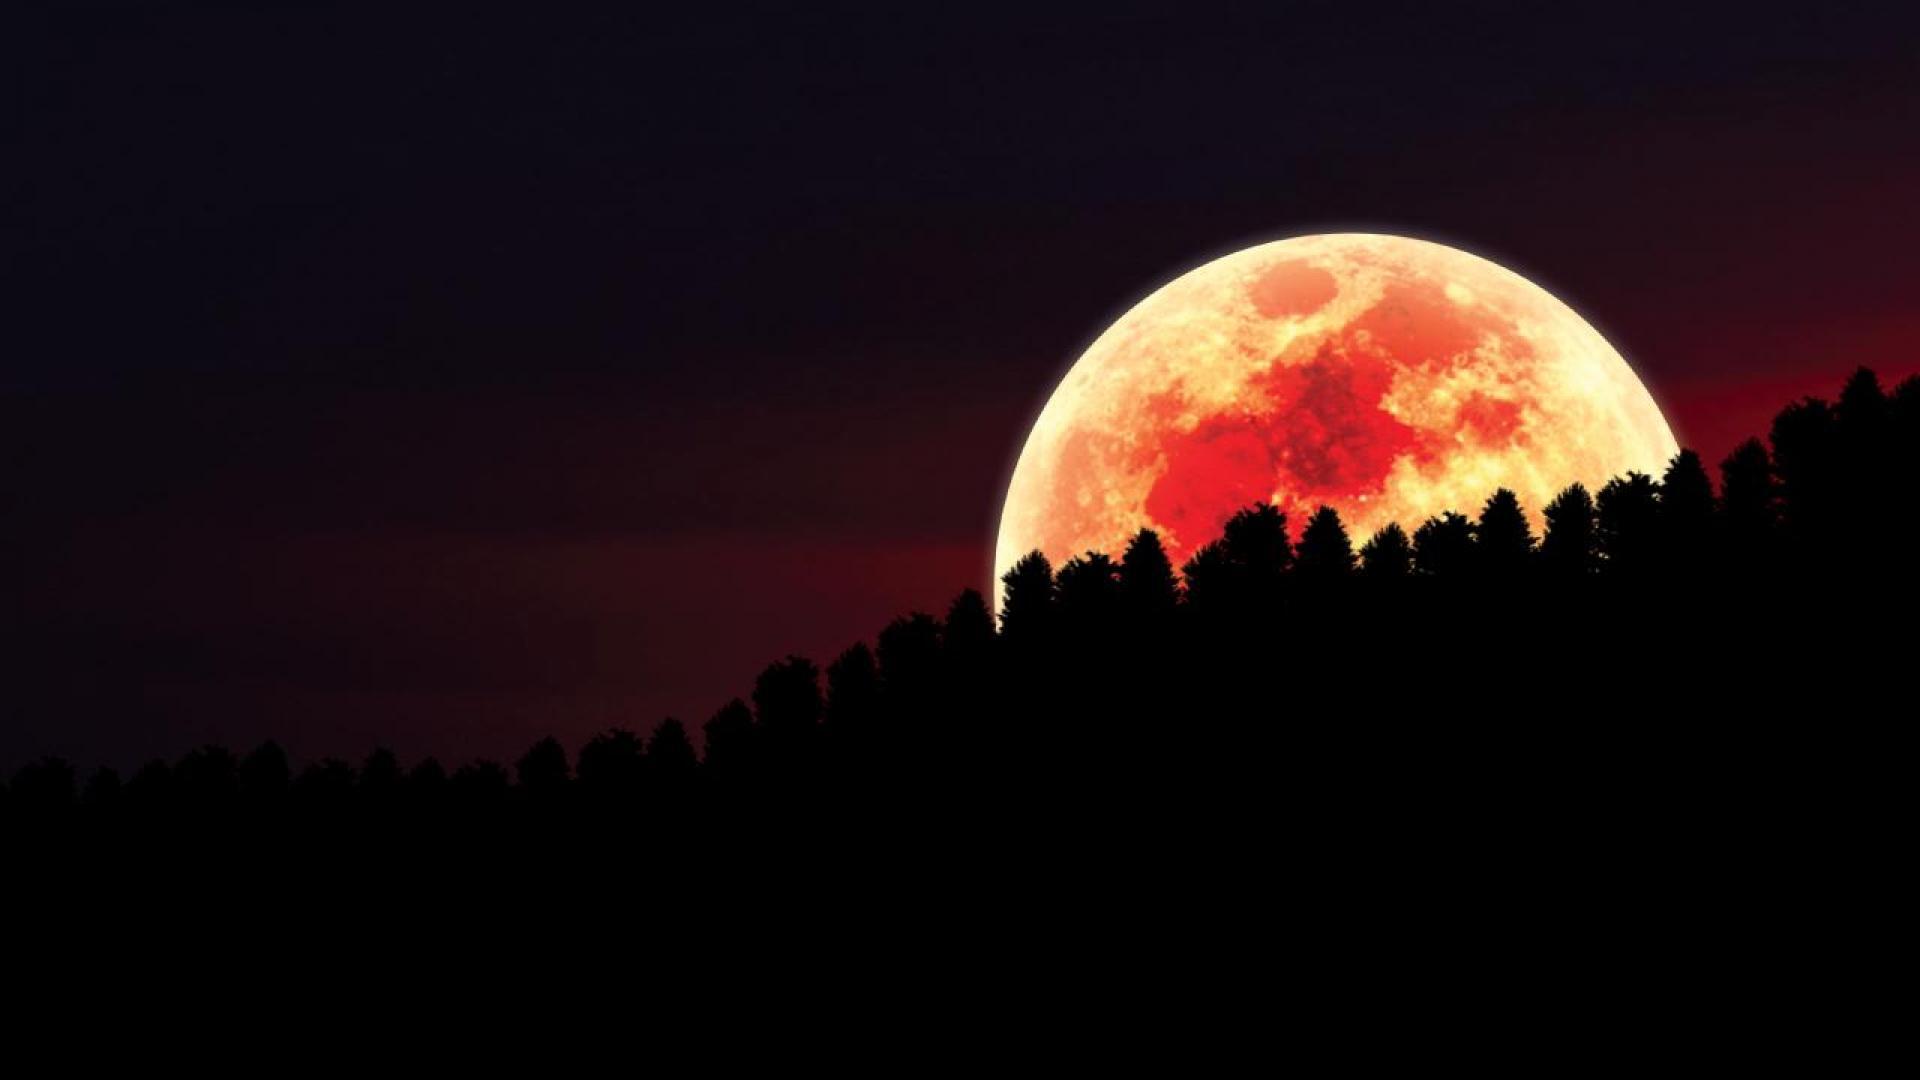 Cool Fall Wallpapers For Desktop Red Moon Wallpaper Hd Pixelstalk Net